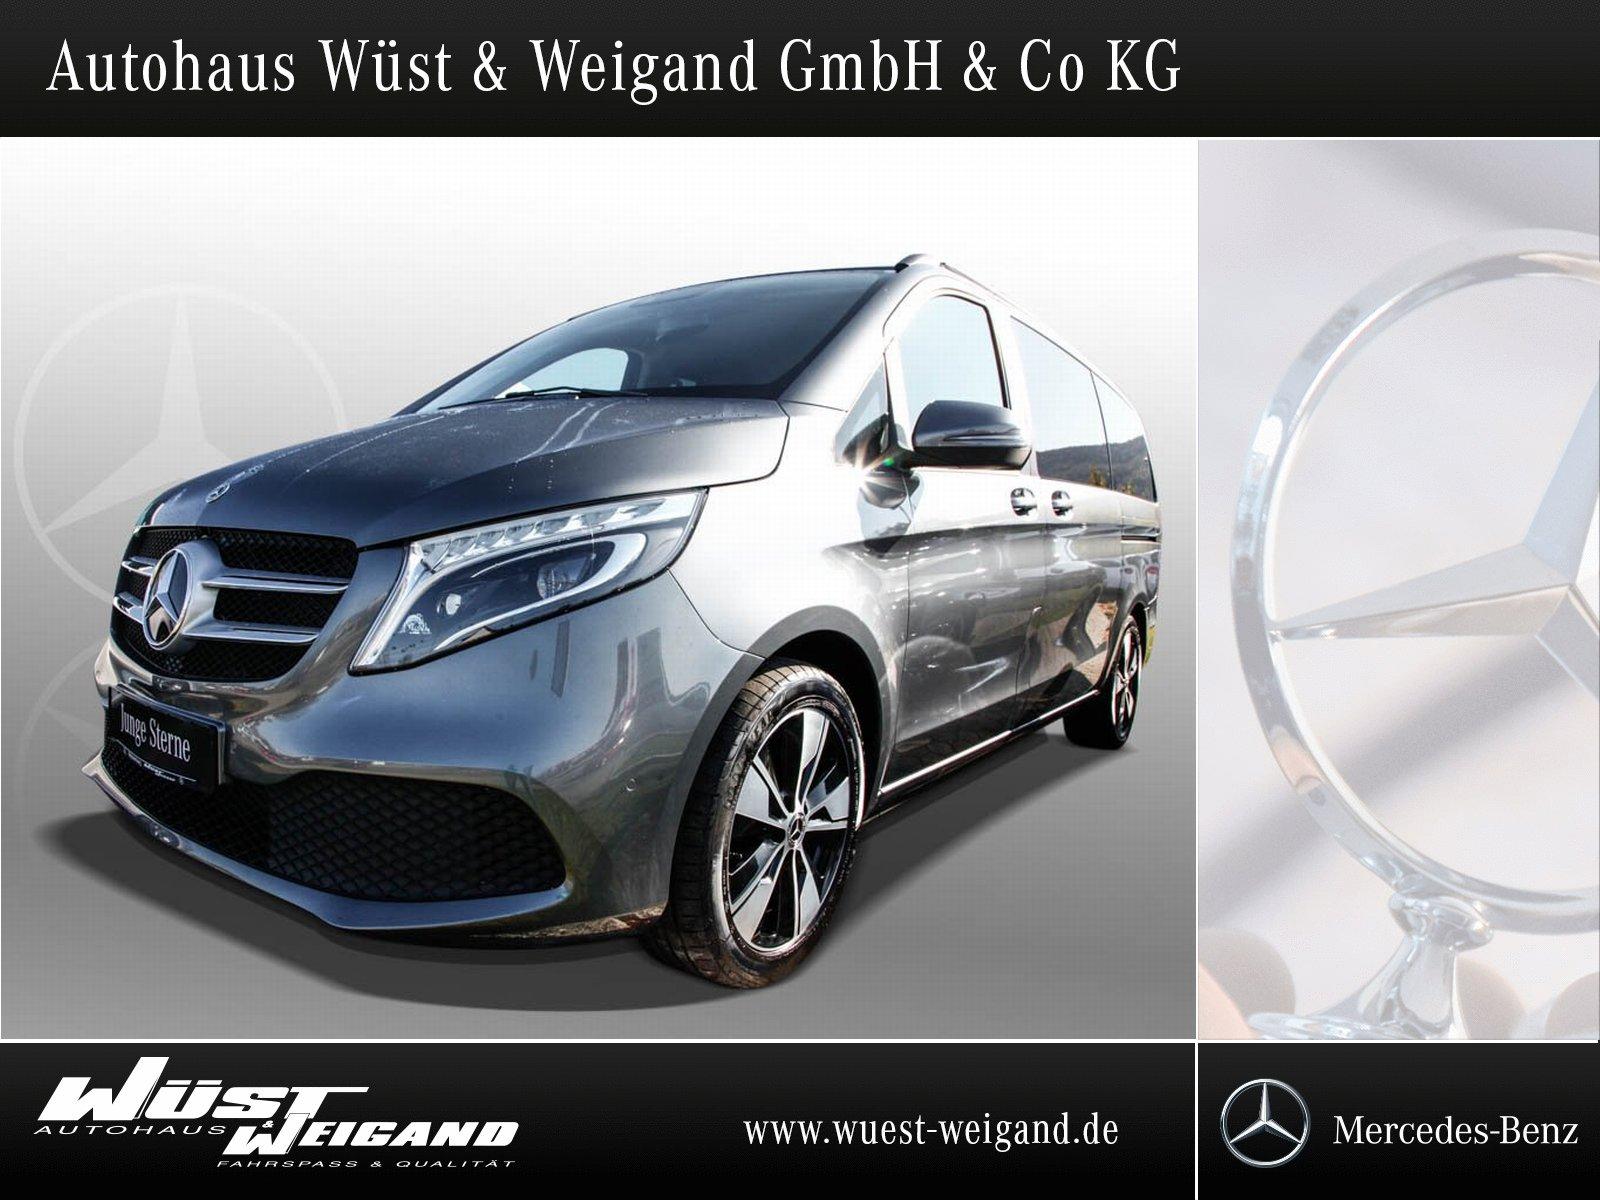 "Mercedes-Benz V 300 d EDITION Lang 7Sitzer+2.Türe+Navi+18""+AHK, Jahr 2019, diesel"